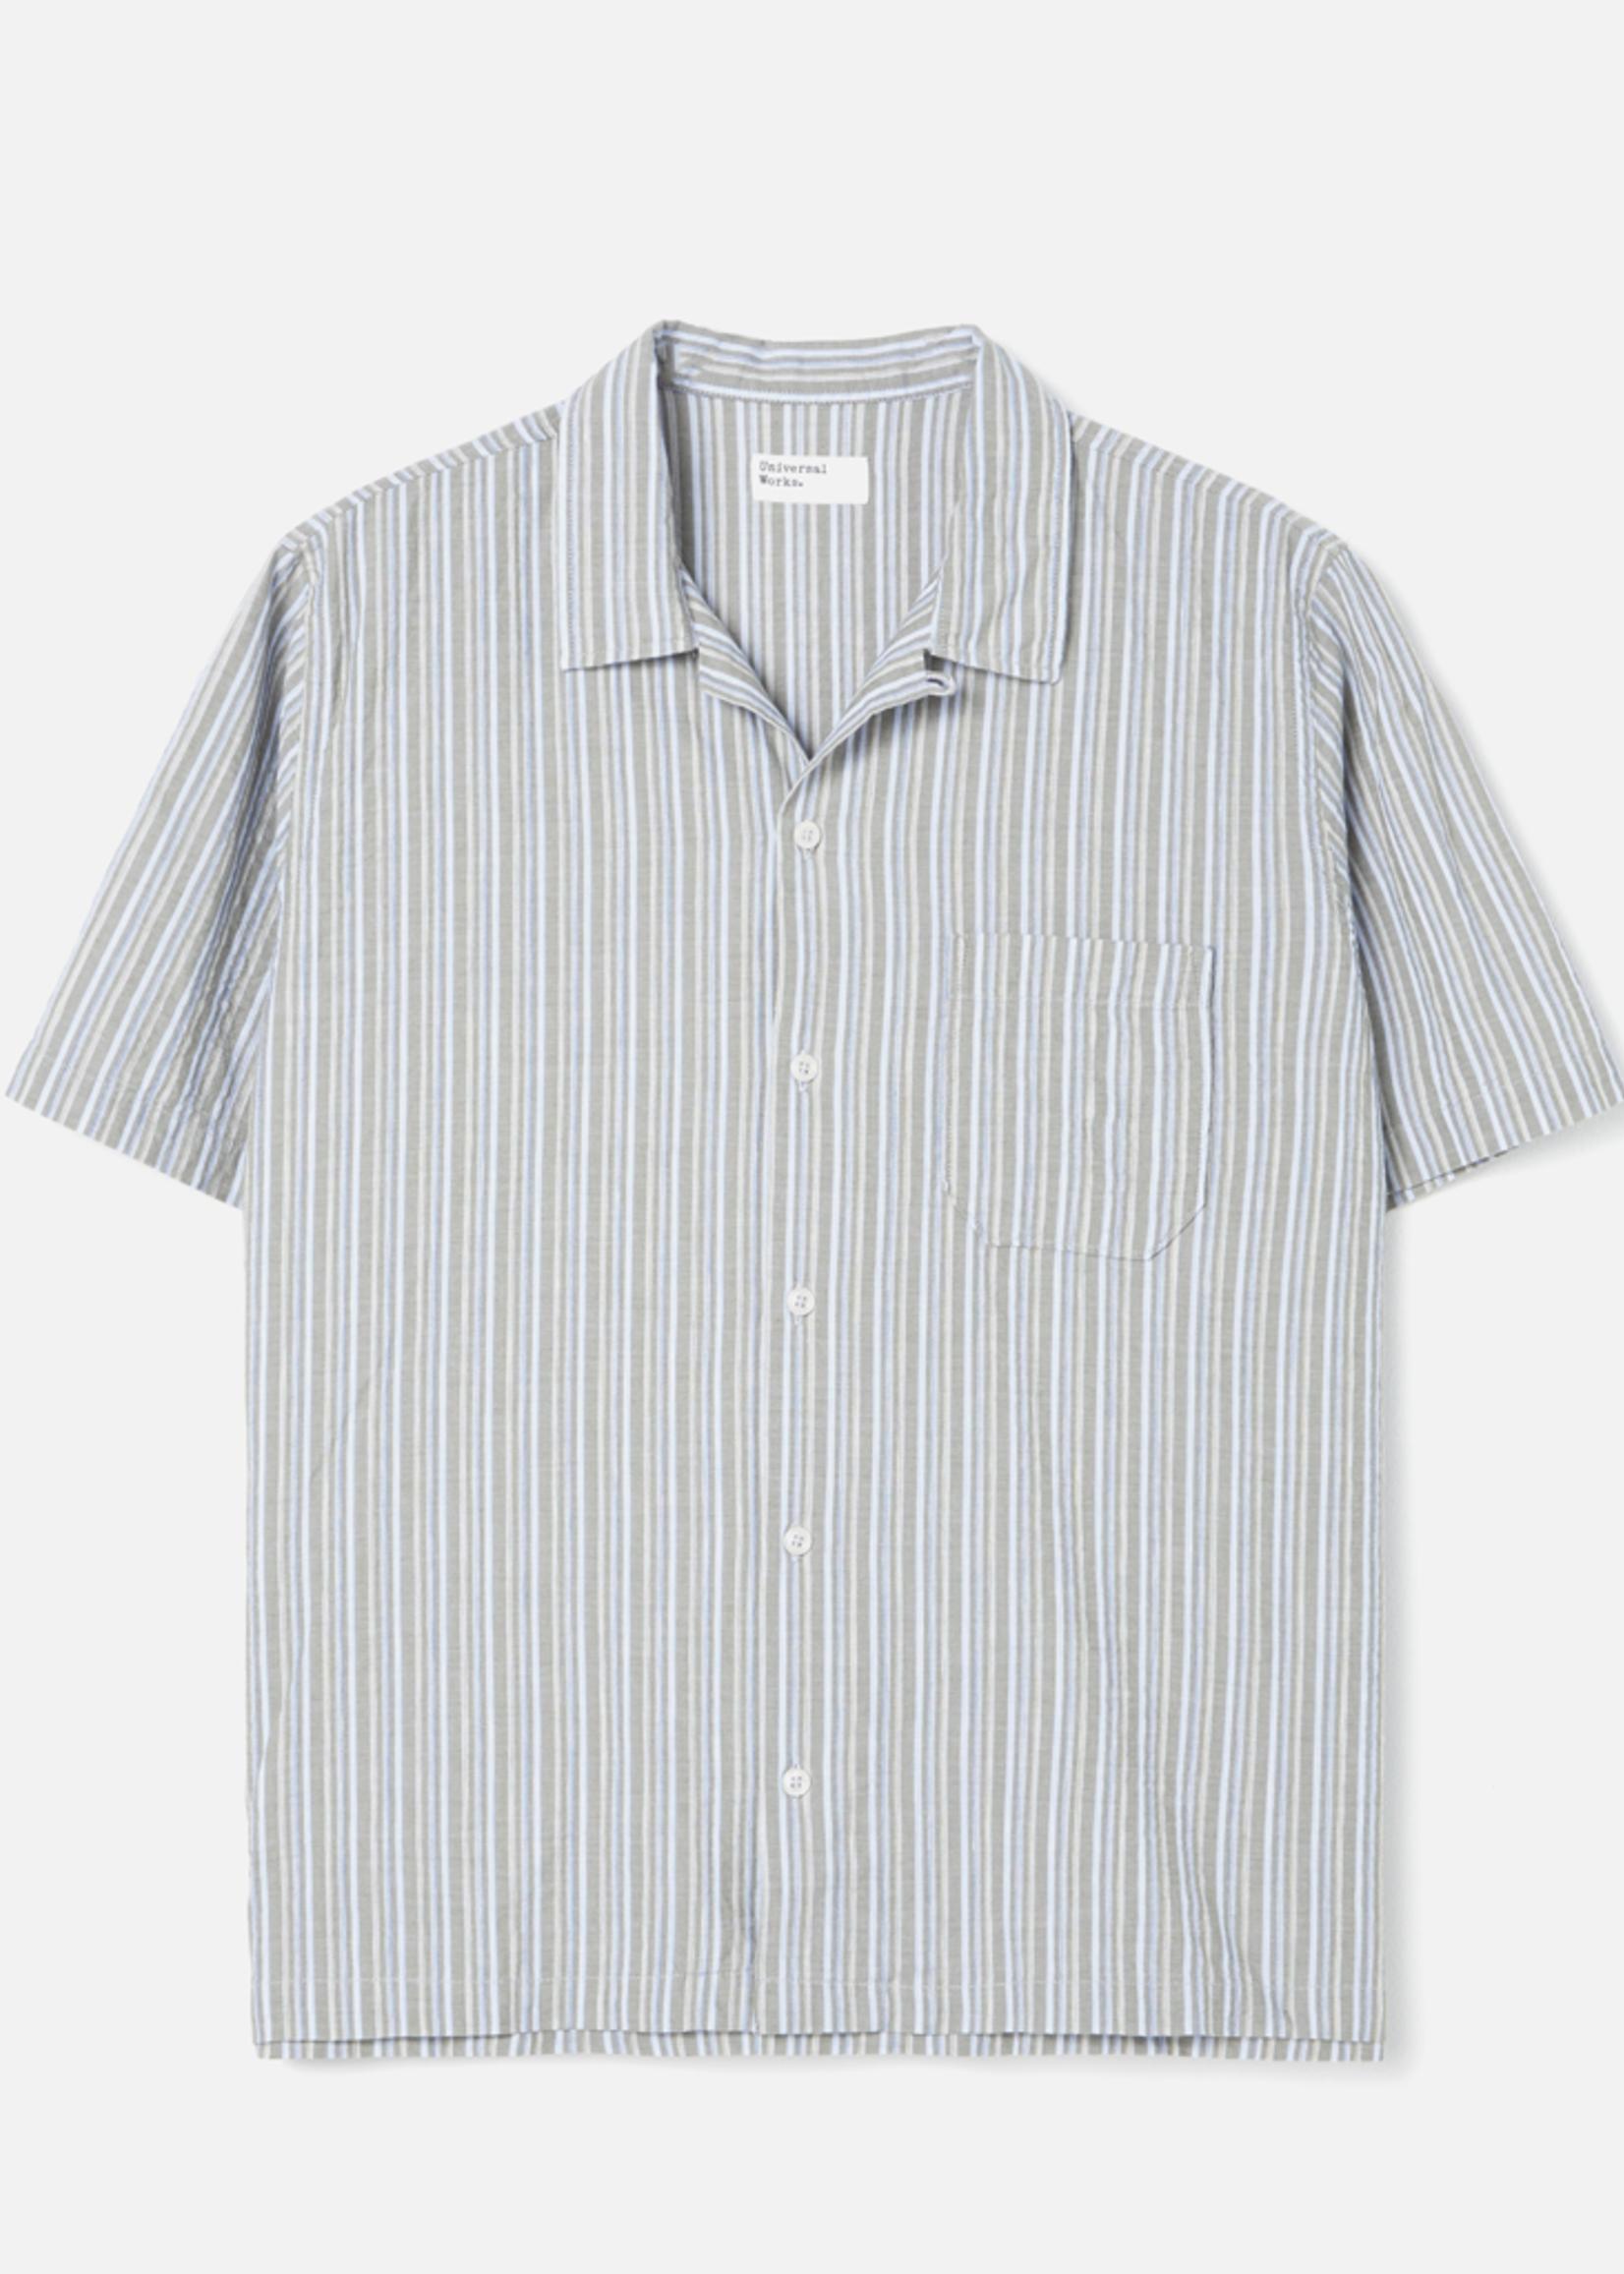 Universal Works Road Shirt Olive Elton 2 Stripe by Universal Works